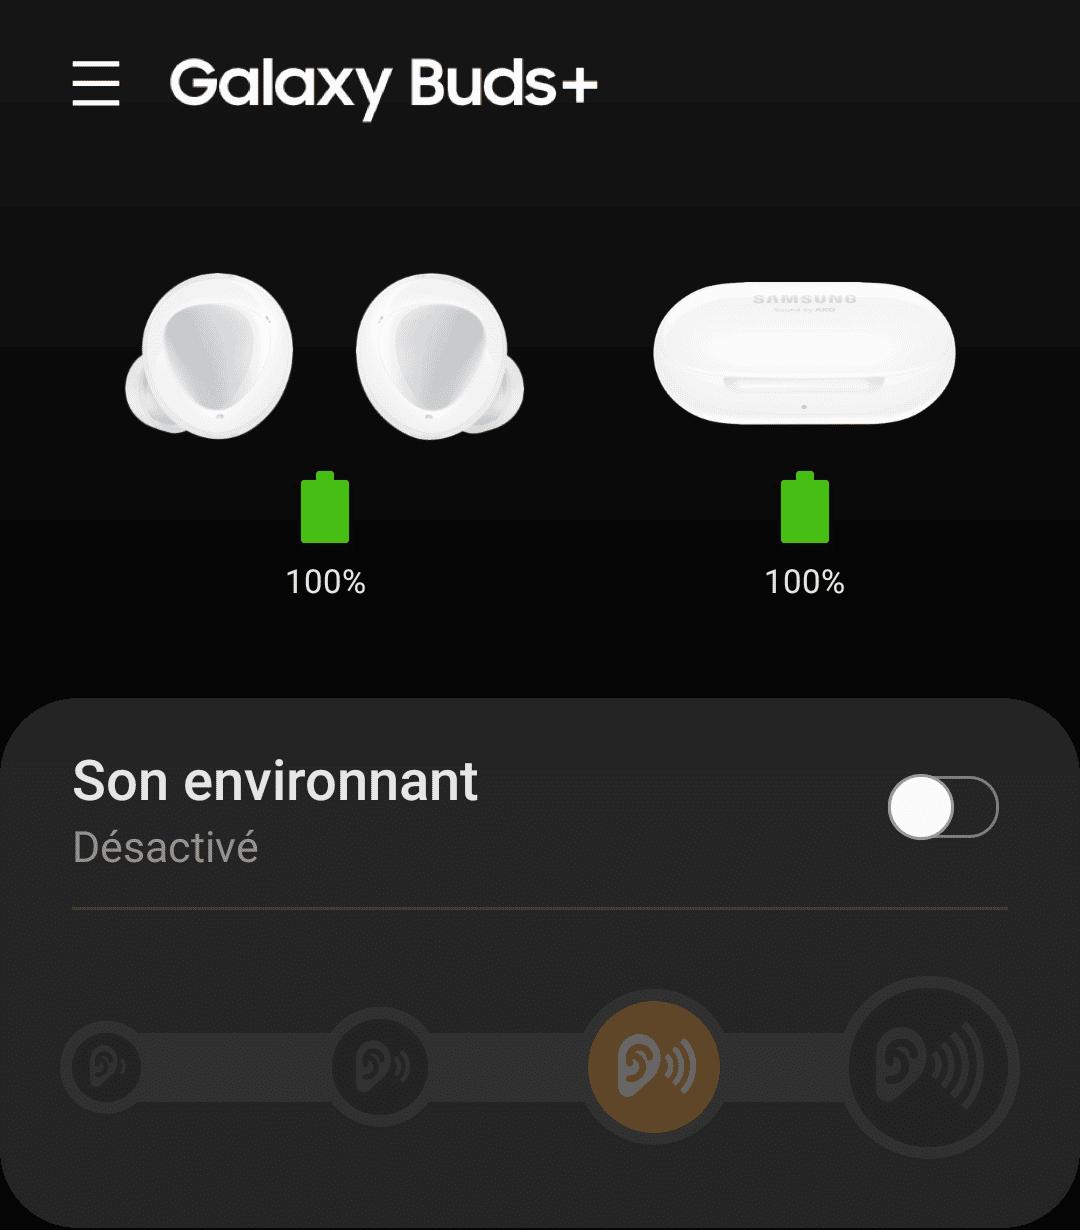 Galaxy Wearables Buds+ S20FE 5G